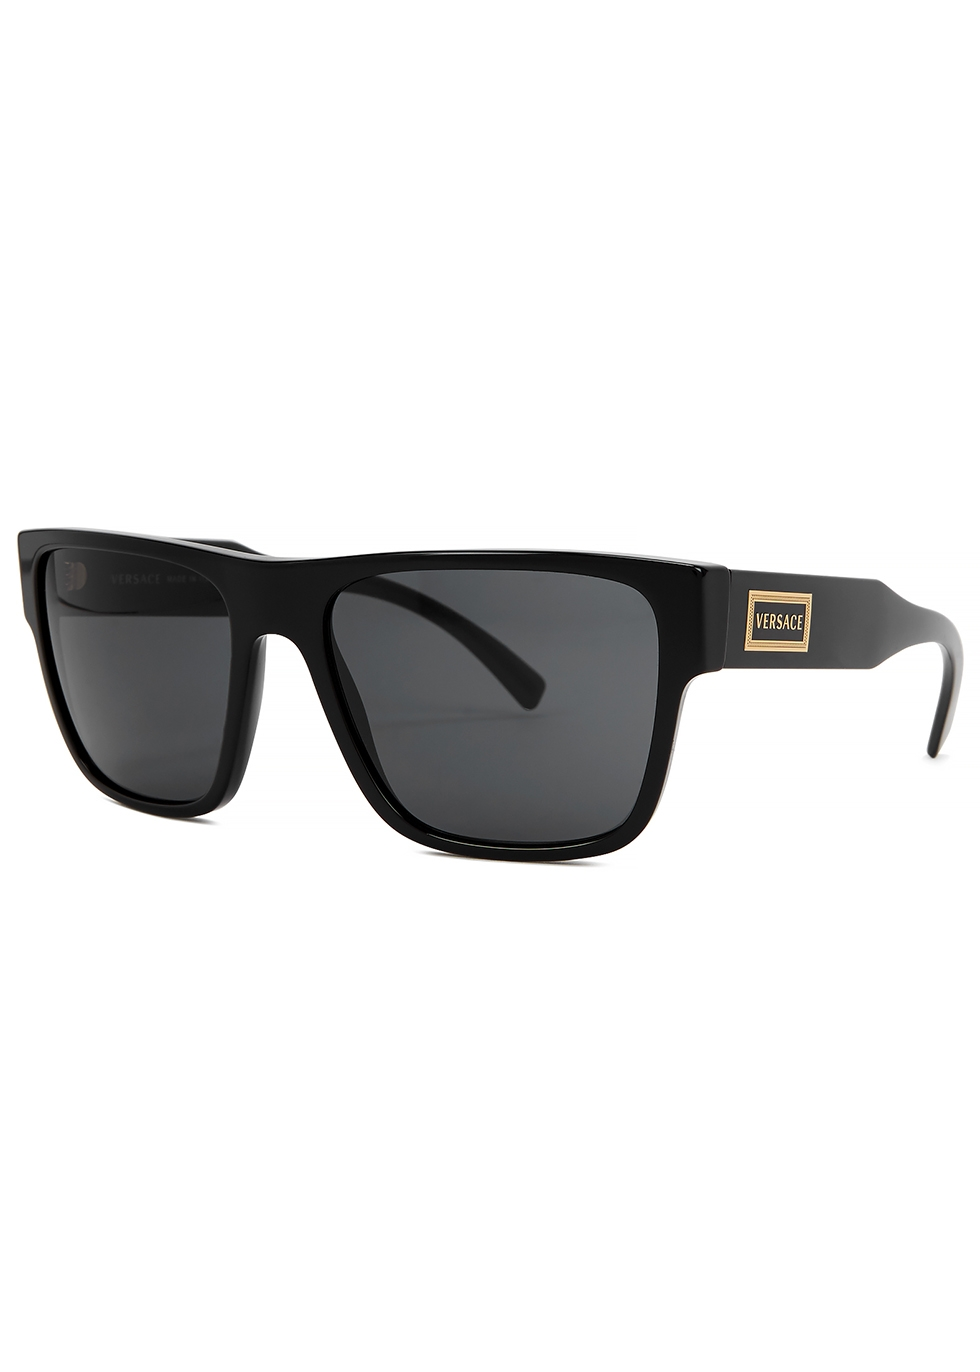 Black wayfarer-style sunglasses